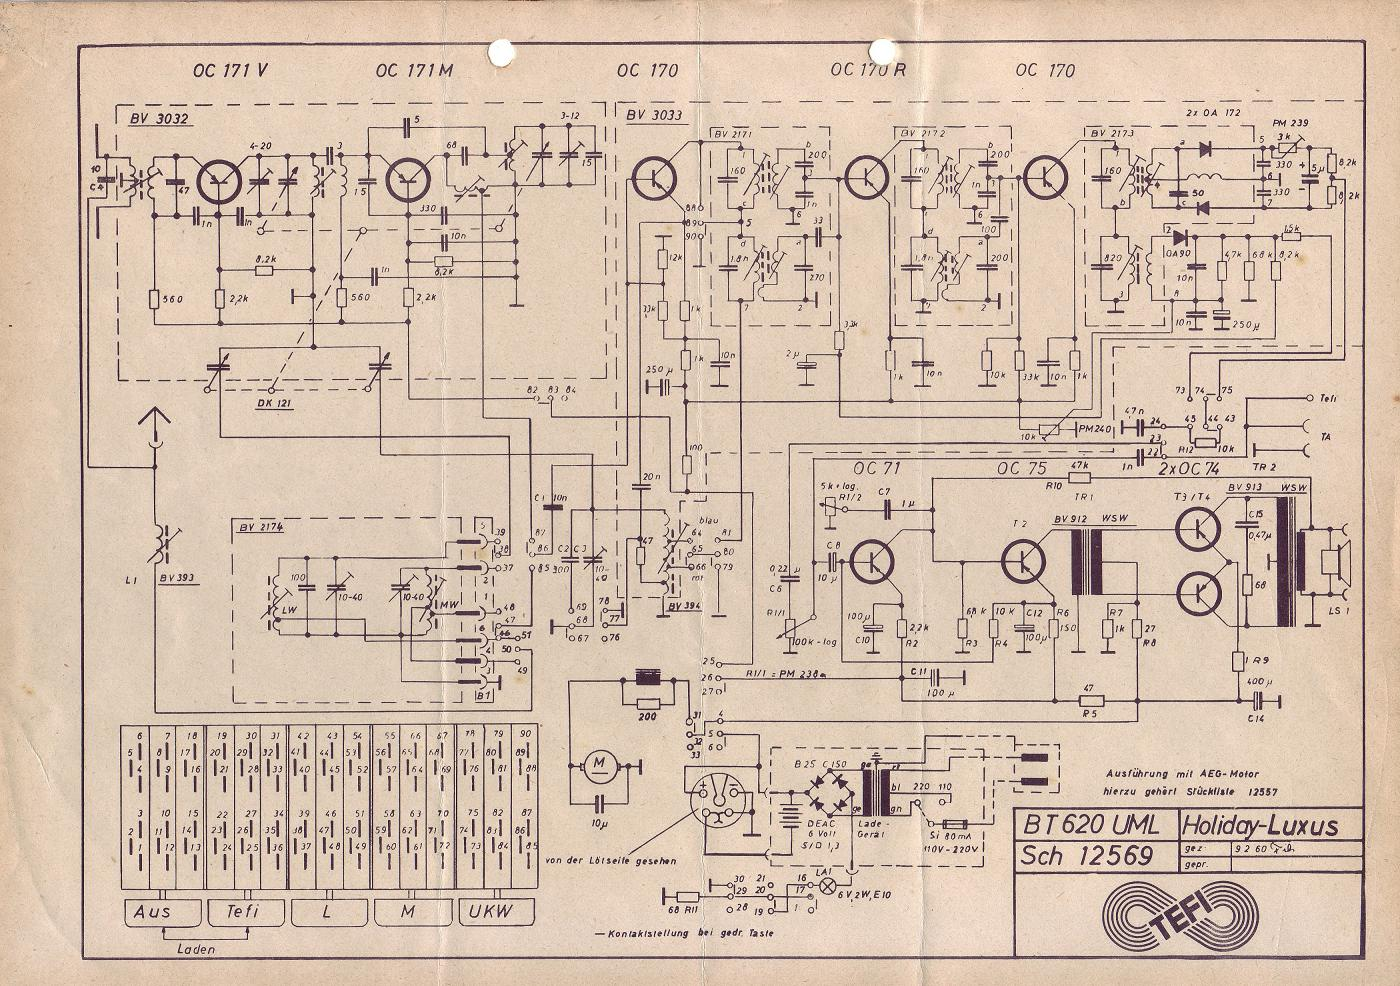 technics sl 1600 wiring diagram international loadstar 1600 wiring diagram